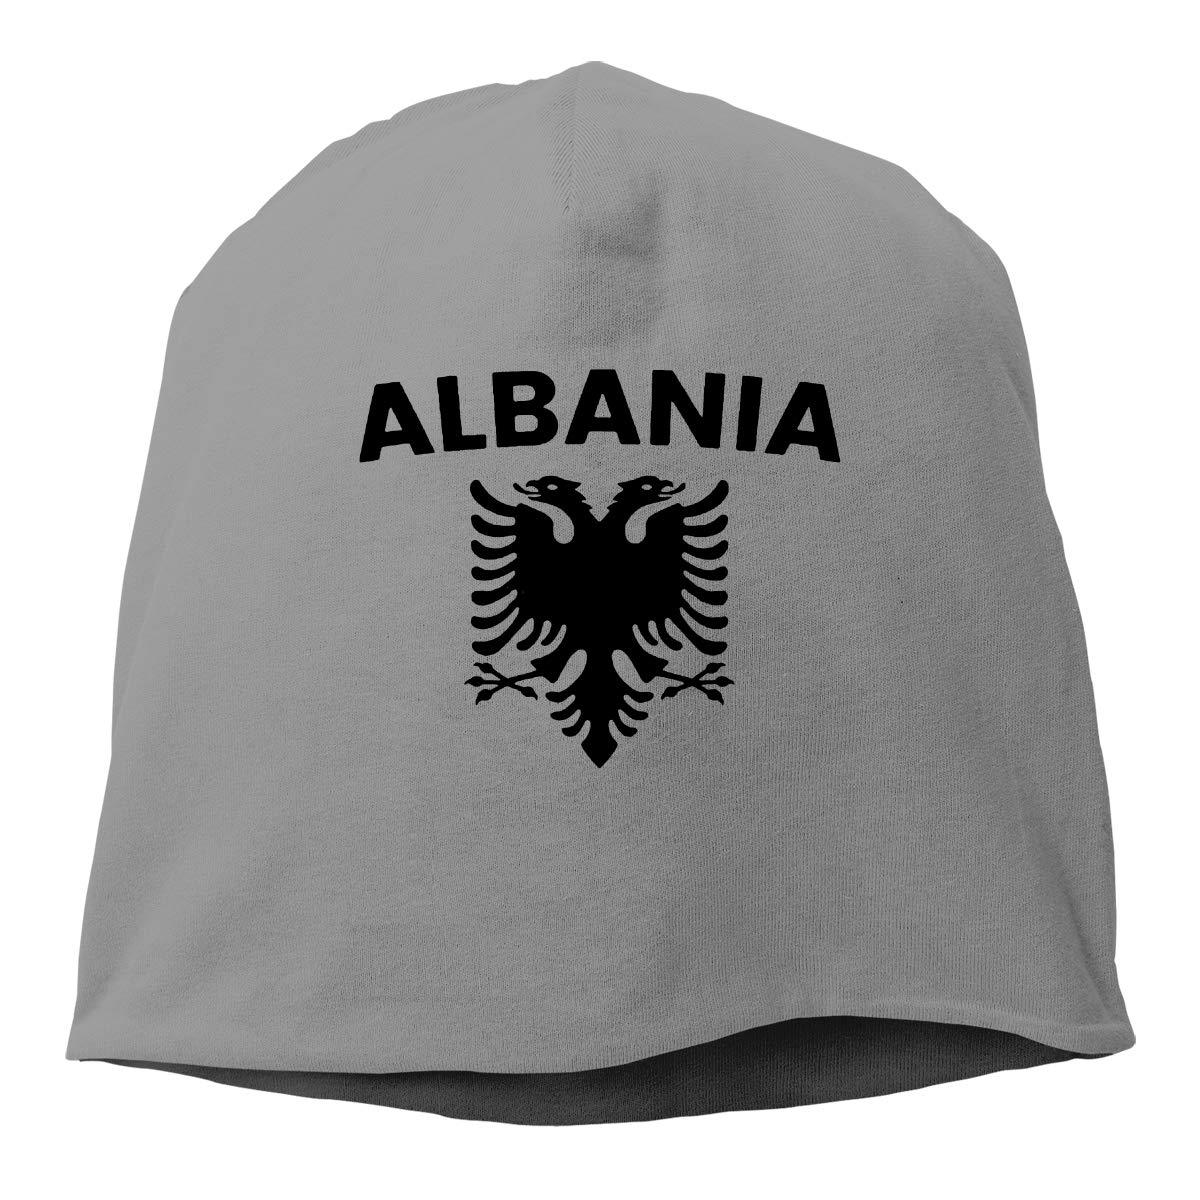 Albanian Eagle Unisex Knitted Hat Beanie Hat Warm Hats Skull Cap